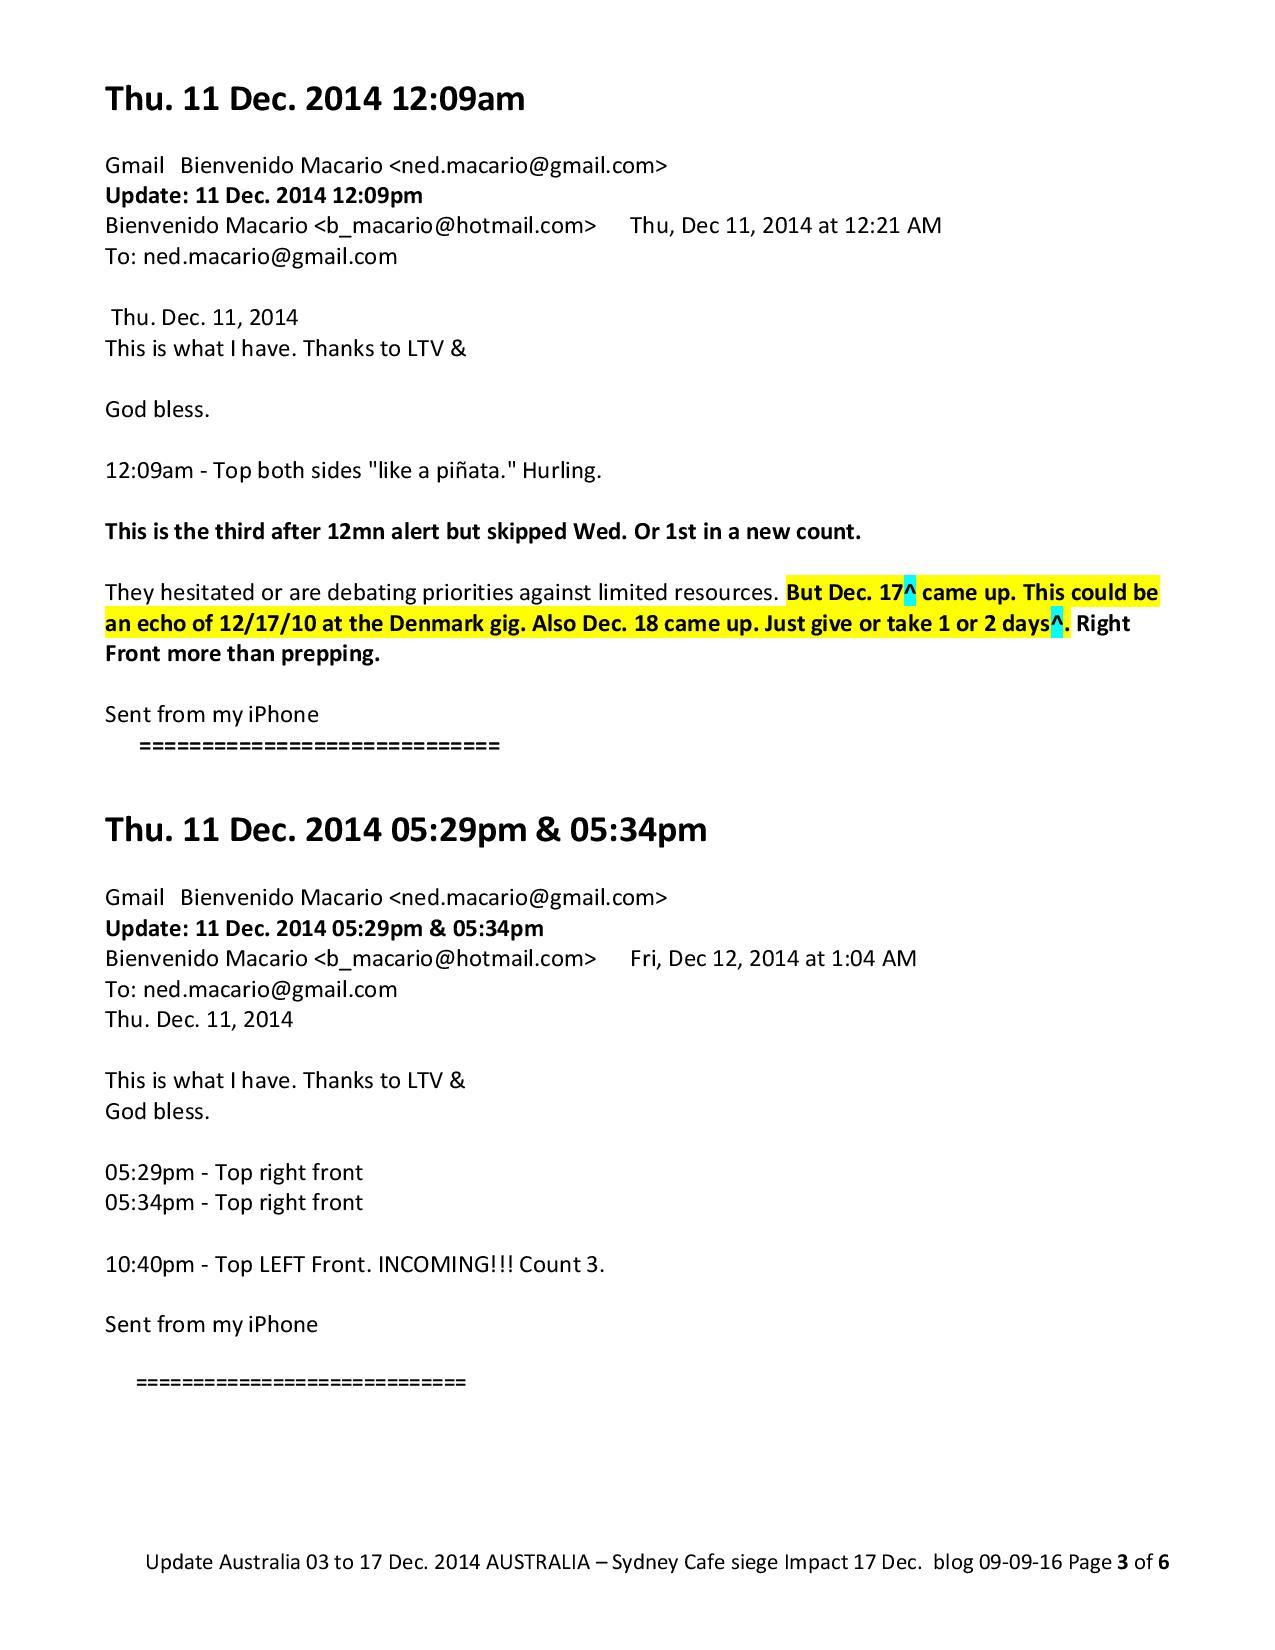 remote-viewing-australia-update-03-to-17-dec-2014-p3-sydney-cafe-siege-impact-date-17-dec-2014